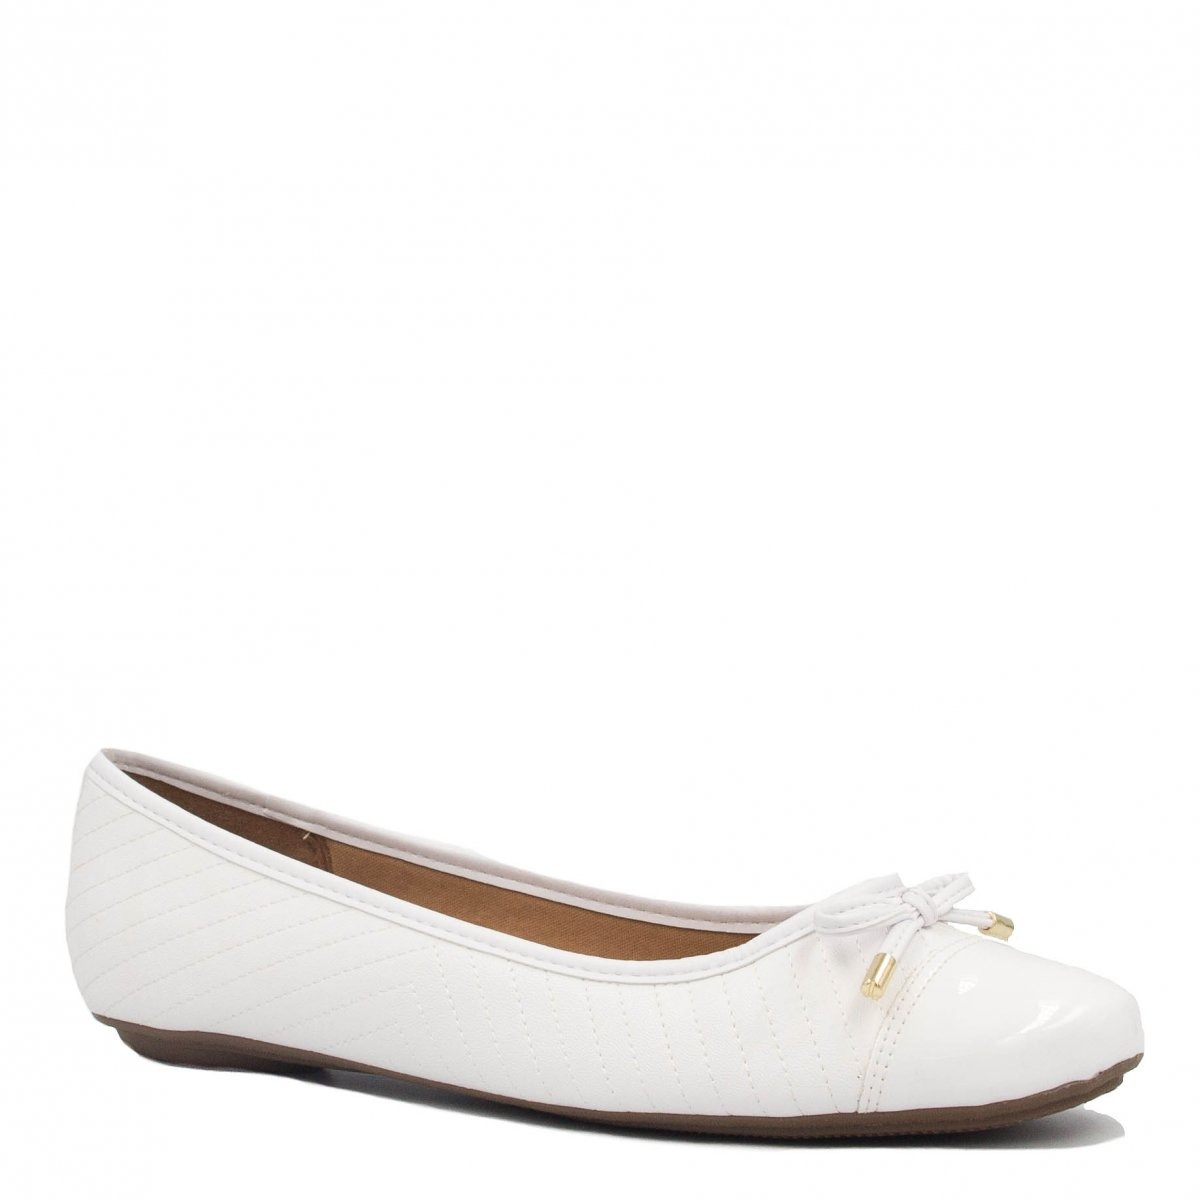 72f5a9491c sapatilha noiva vizzano captoe verniz laço branco 1155.149. Carregando zoom.